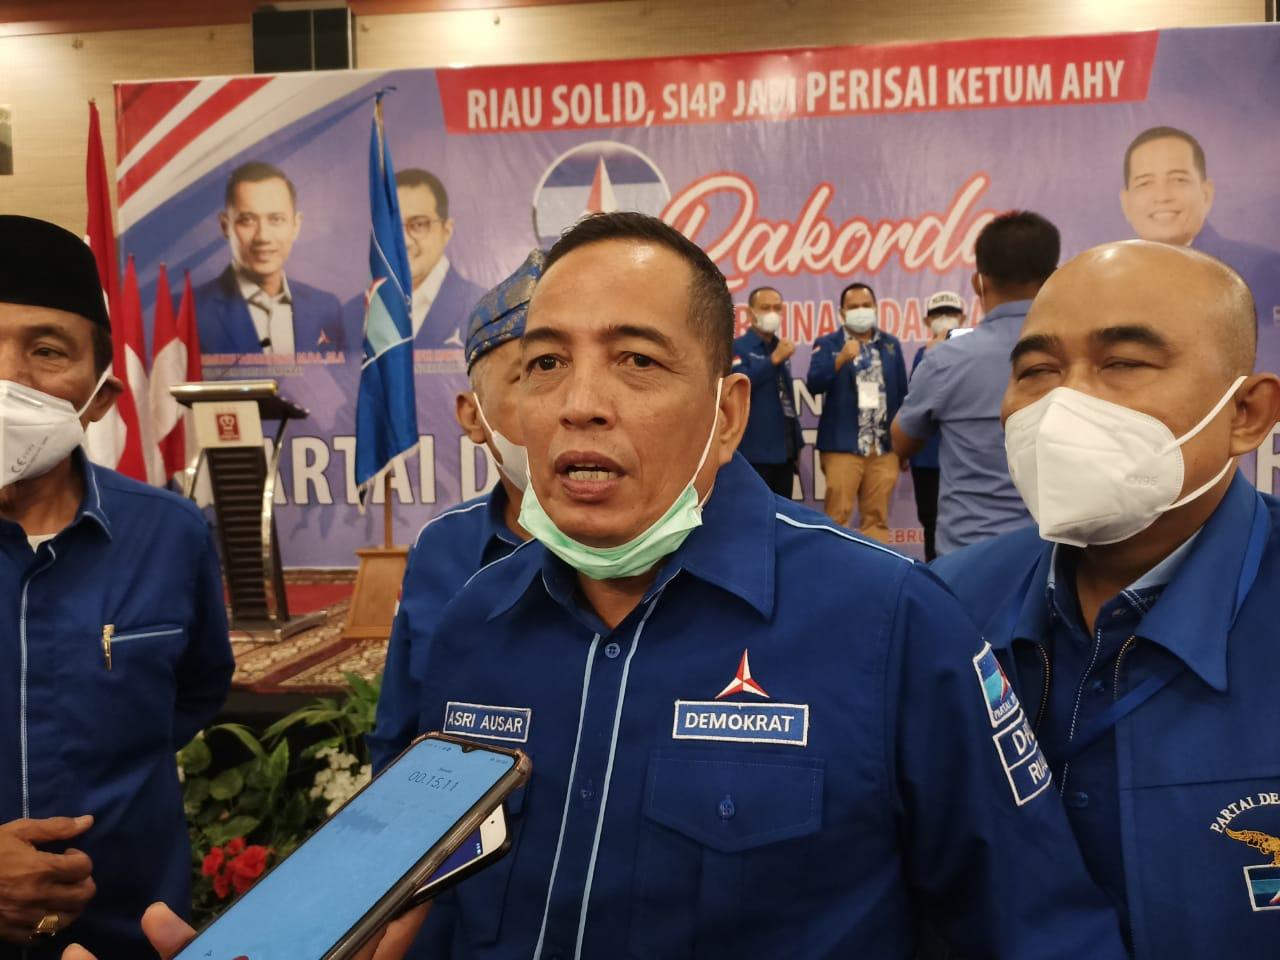 Demokrat Riau Pilih Jalur Hukum Jika Ada Kelompok Klaim Nama Partainya